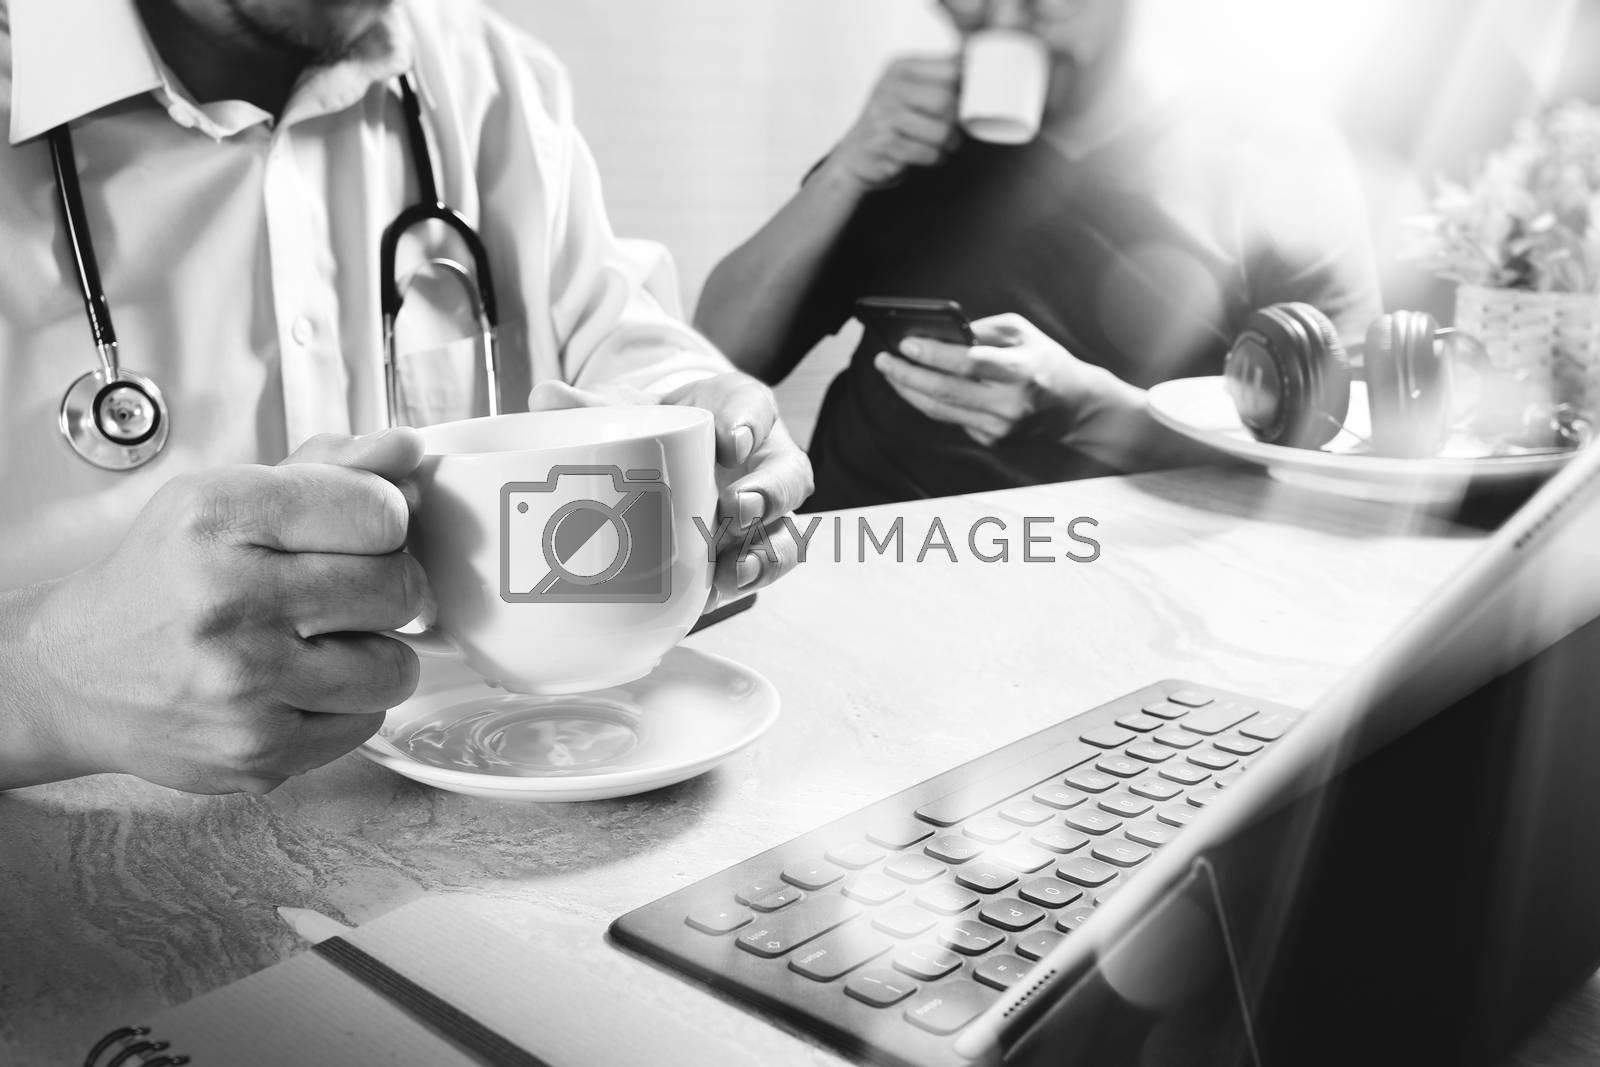 Medical doctor team taking coffee break.using digital tablet docking smart keyboard and smart phone on marble desk.listen music,filter film effect,black white